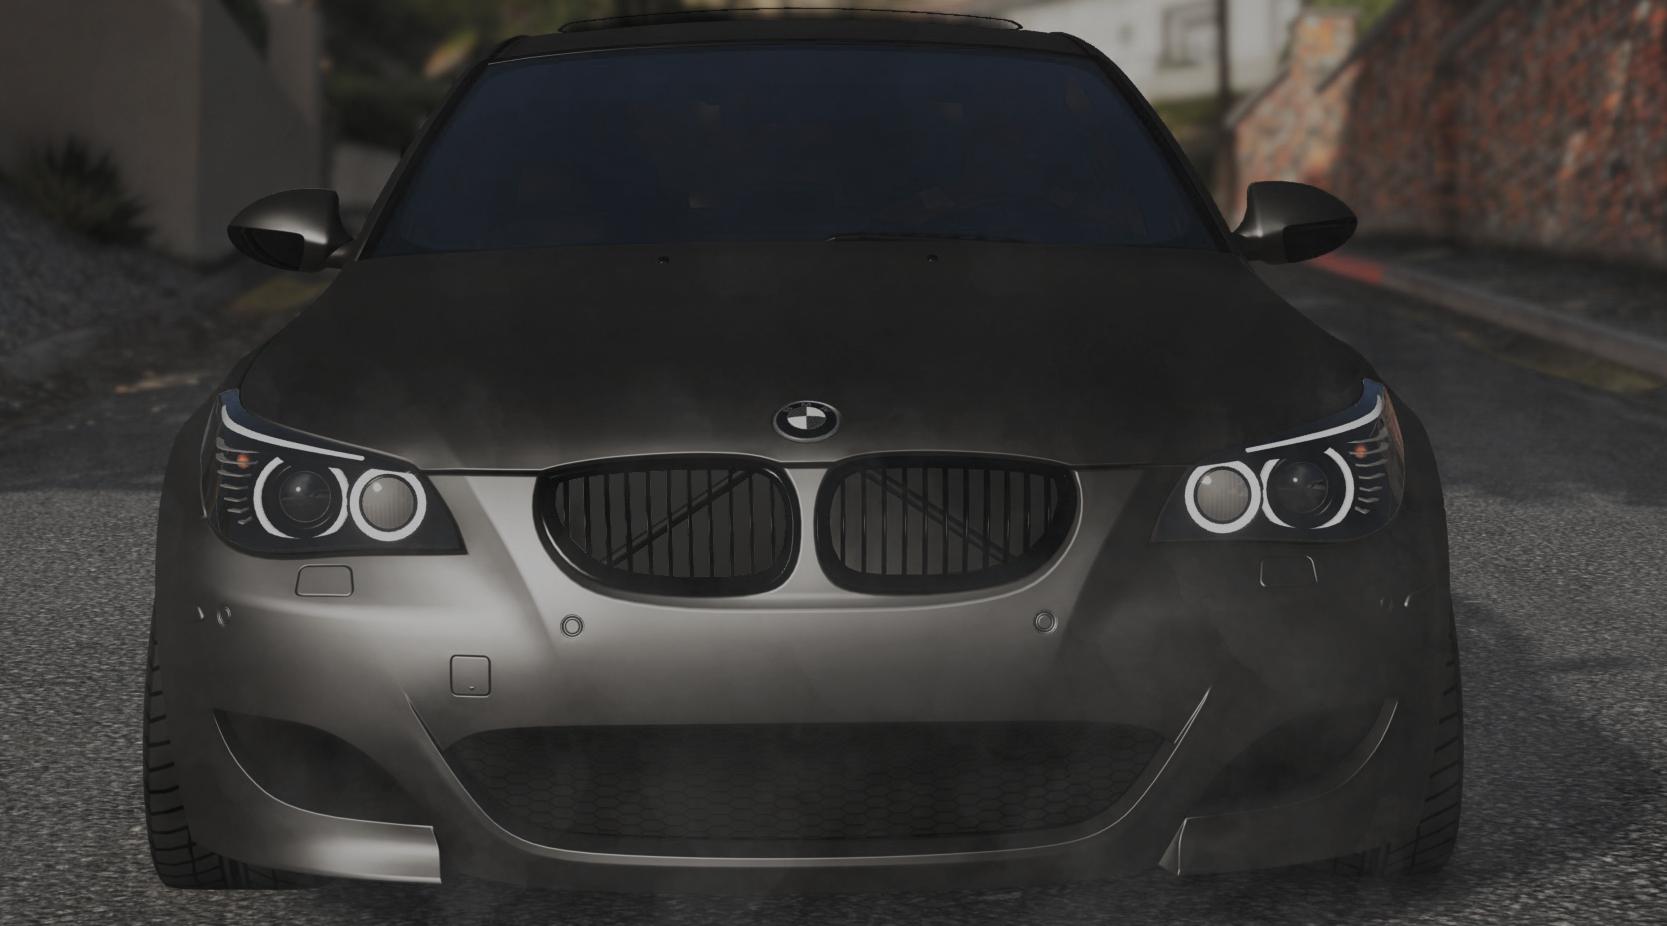 BMW E60 M5 [Add-On   Tuning   Liveries] - GTA5-Mods.com